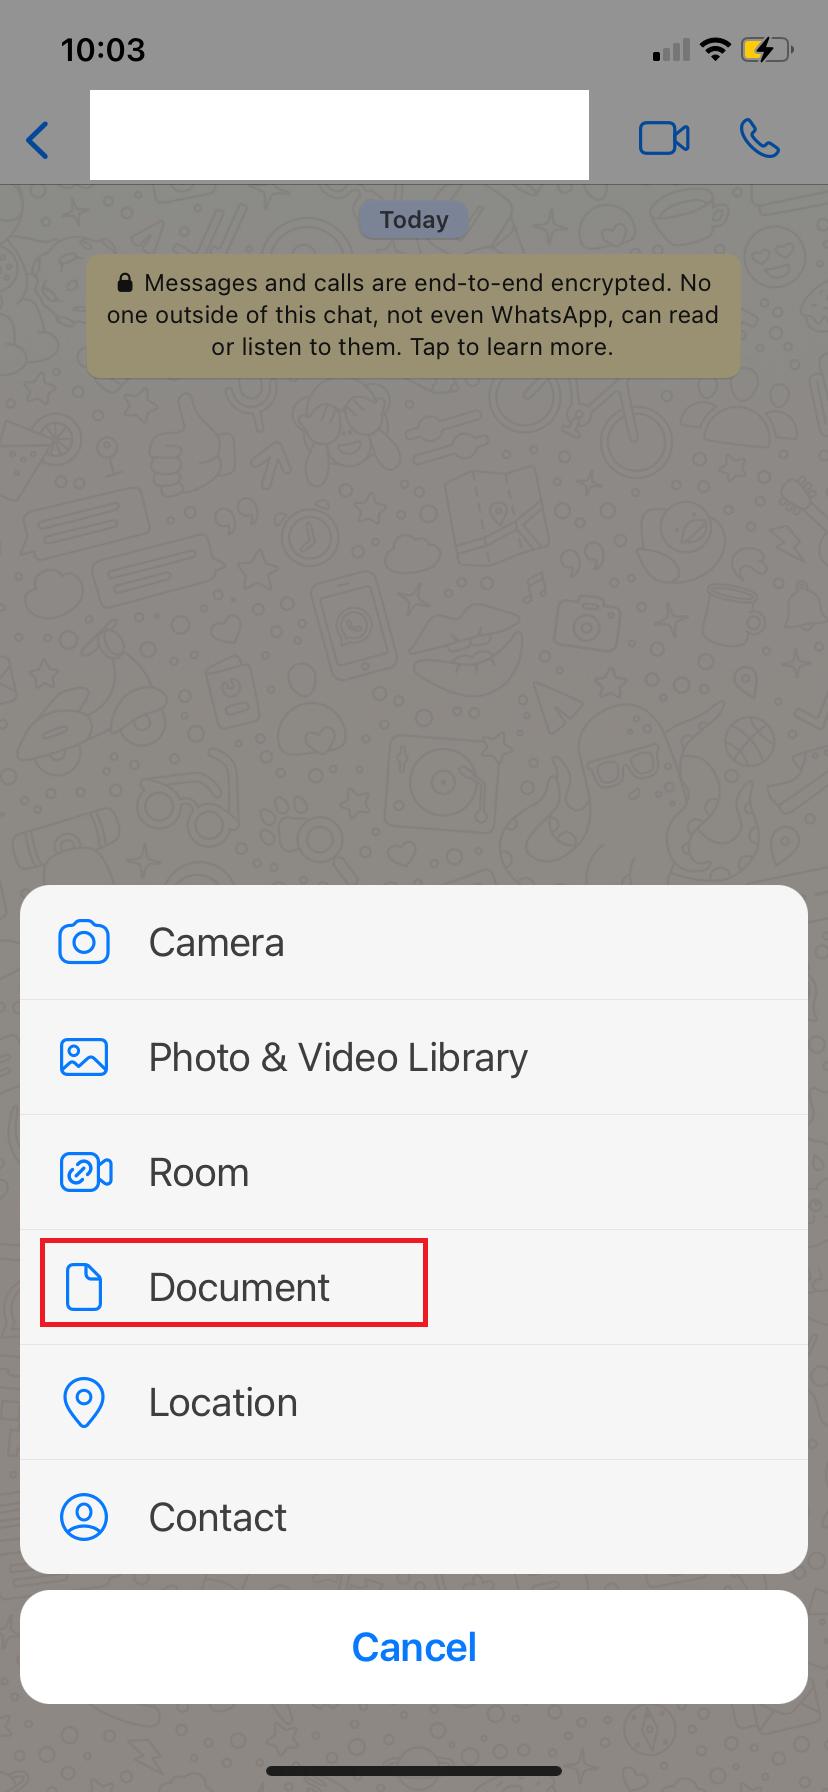 screenshot of whatsapp choosing documents in options